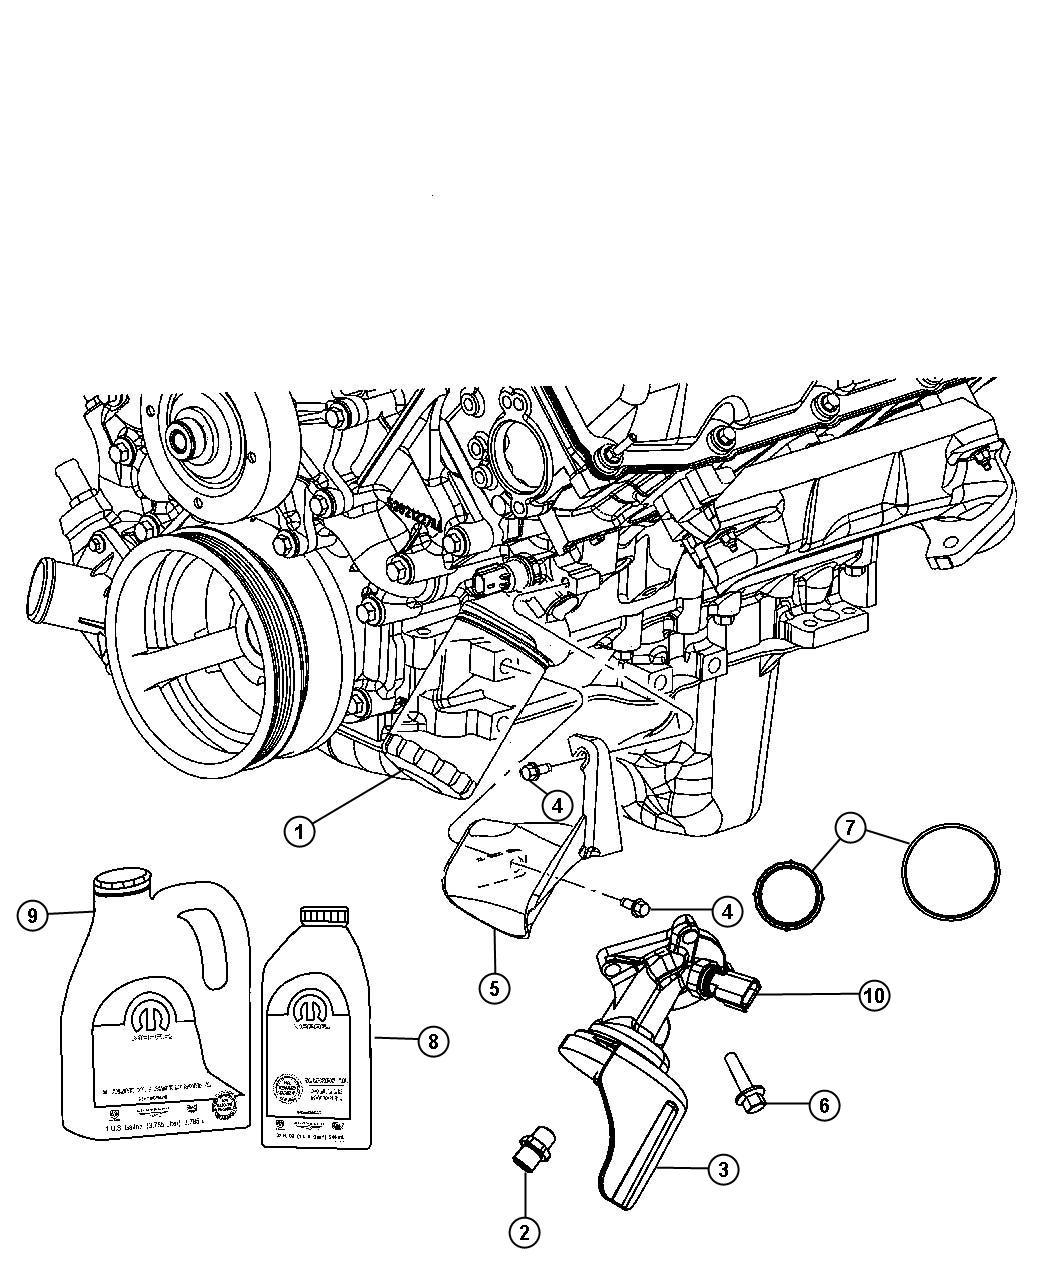 Chrysler Sending Unit Oil Pressure Adaptercooler